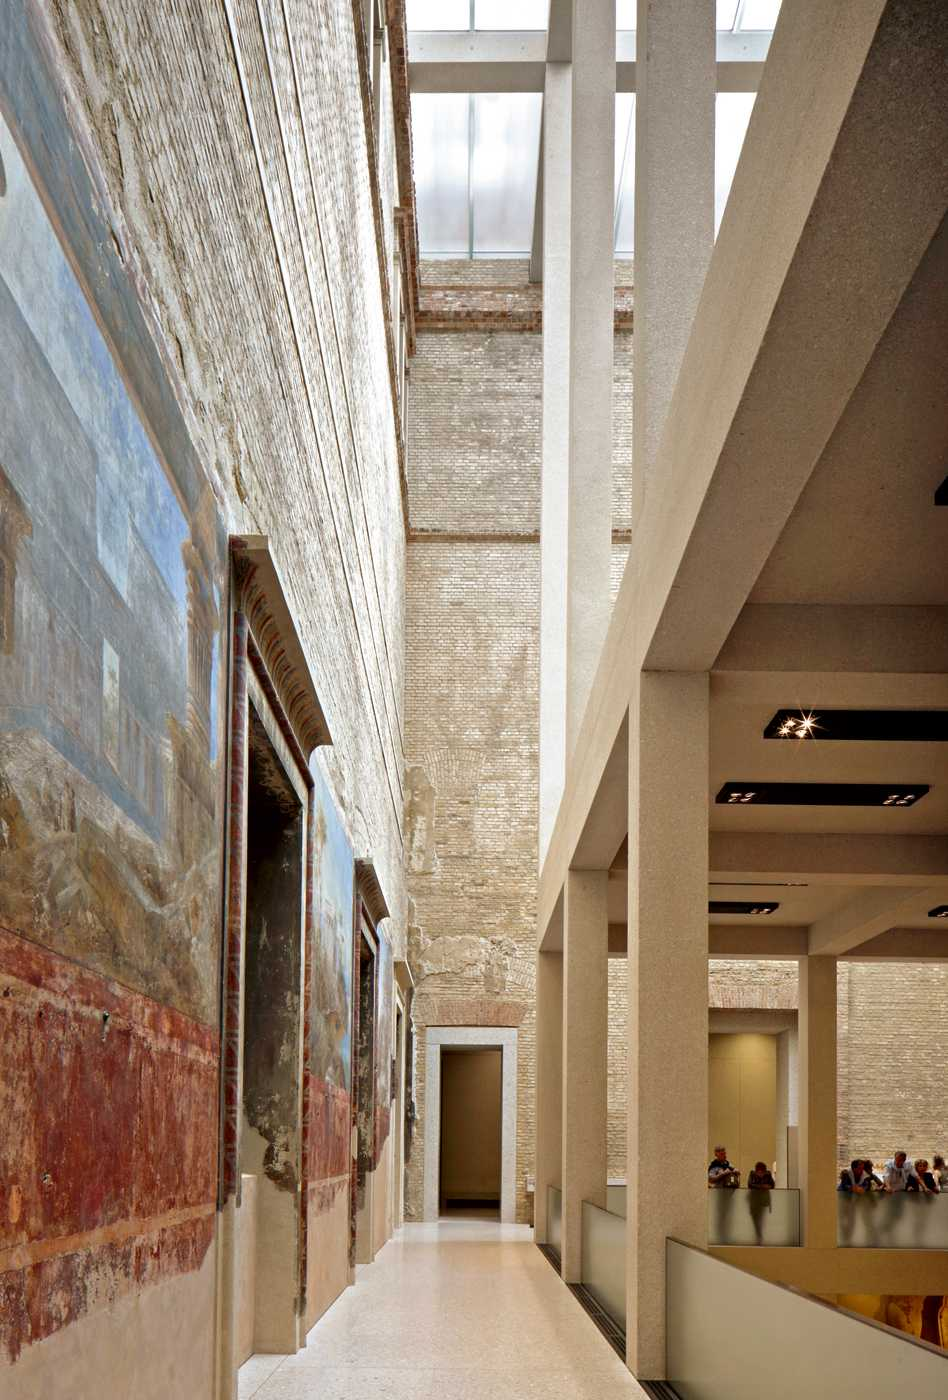 James Simon Galerie  - 17 3.2 36